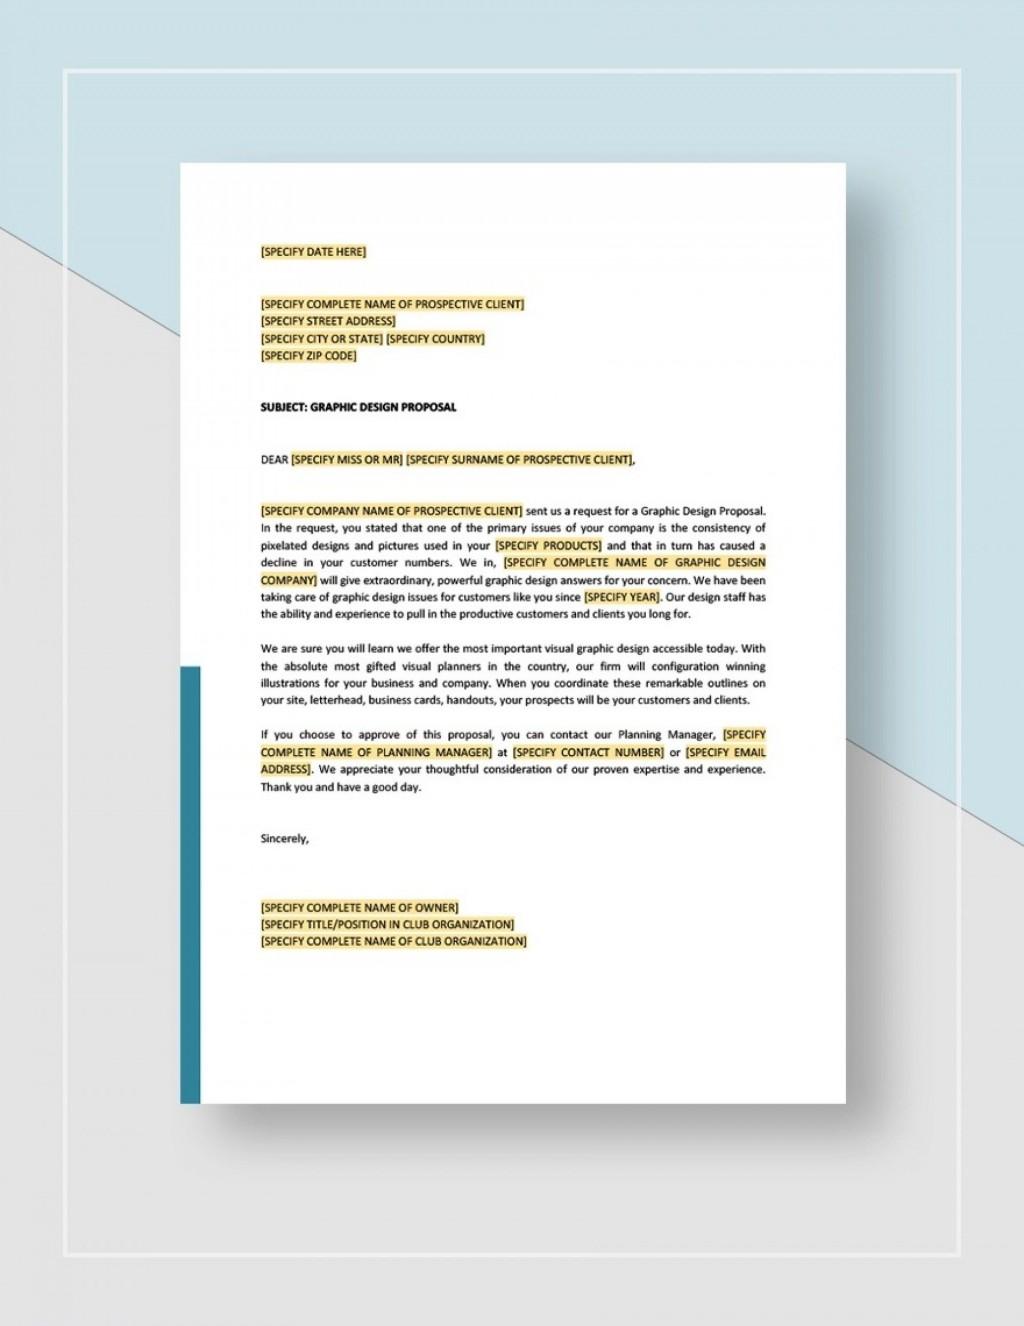 009 Singular Graphic Design Proposal Template Free Example  Freelance Pdf IndesignLarge